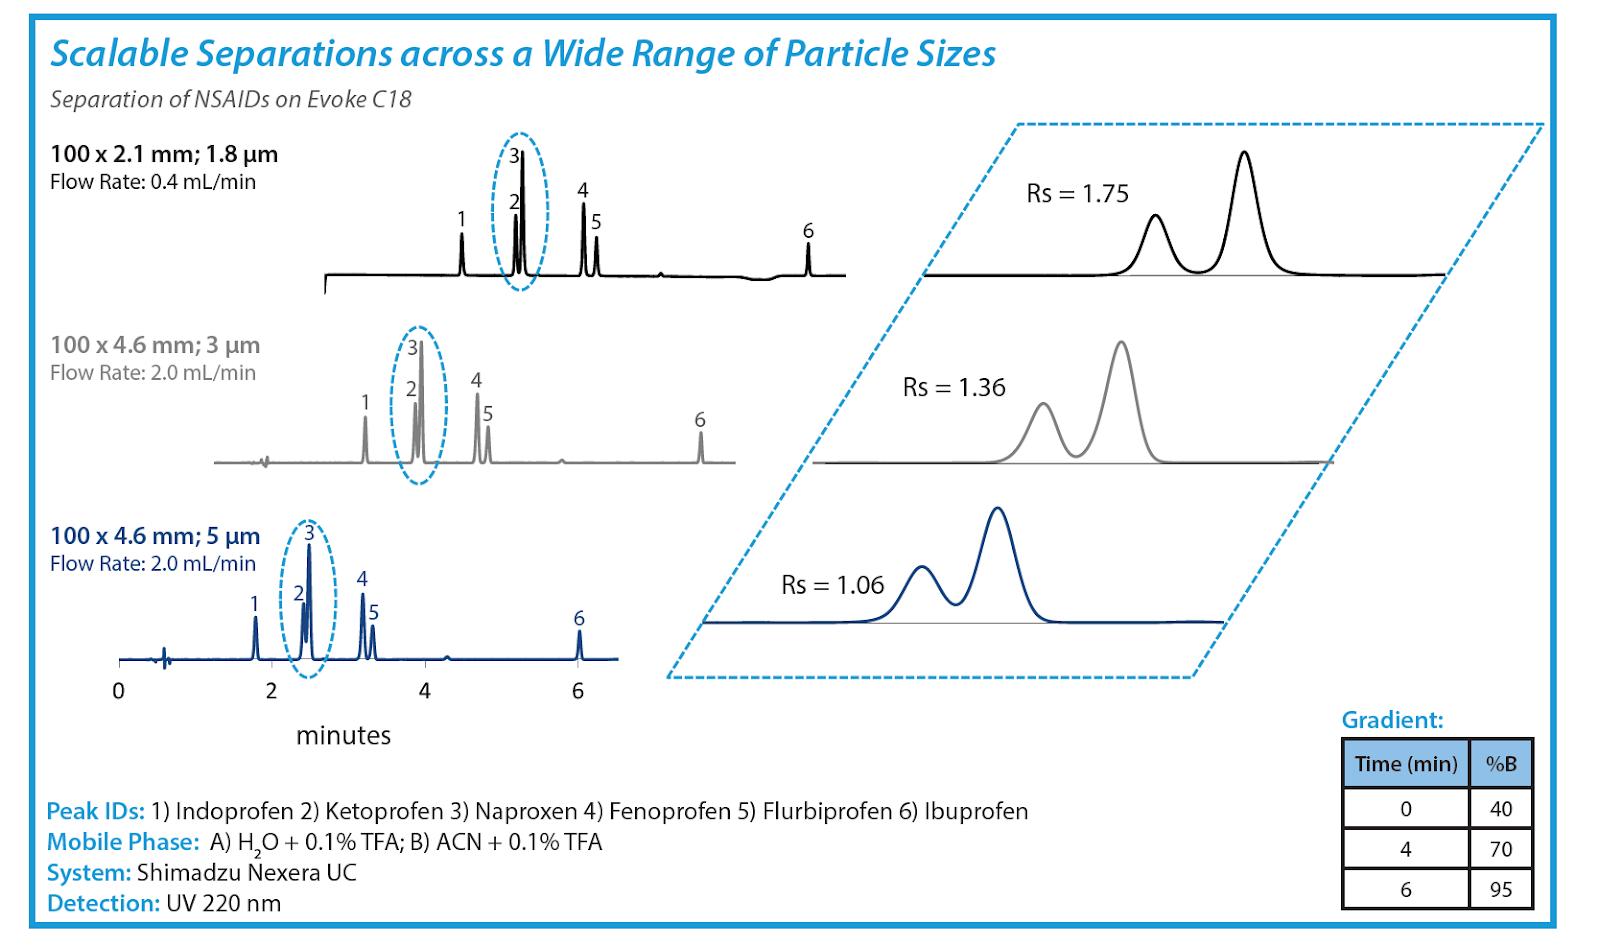 Evoke C18 van deemter plot shows scalable separations across a wide range of particle sizes.